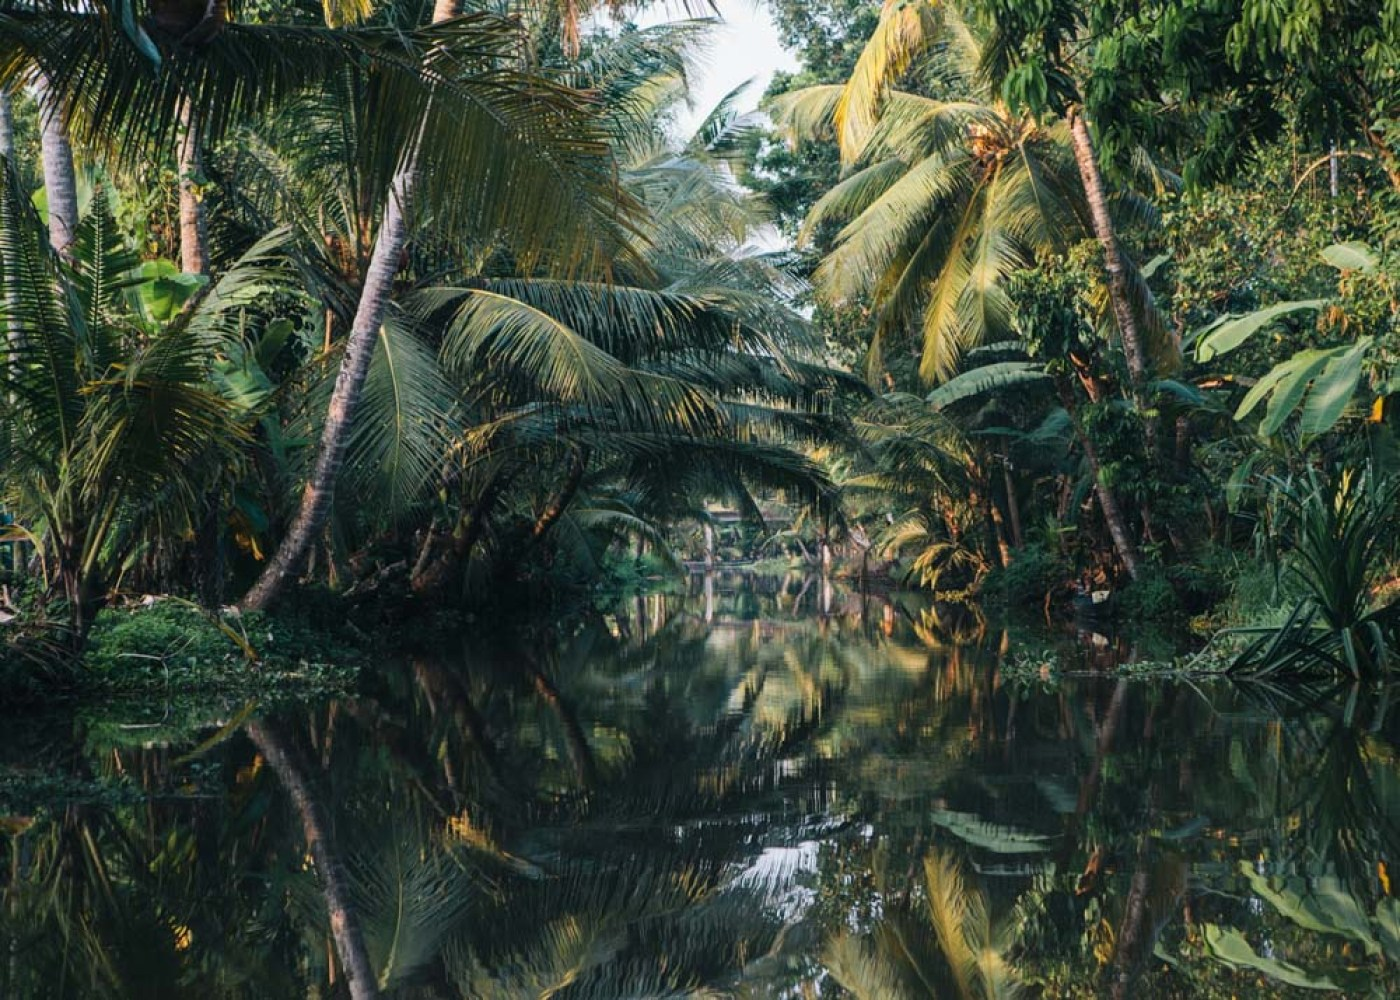 Kerala backwaters boat trip palms reflected in water